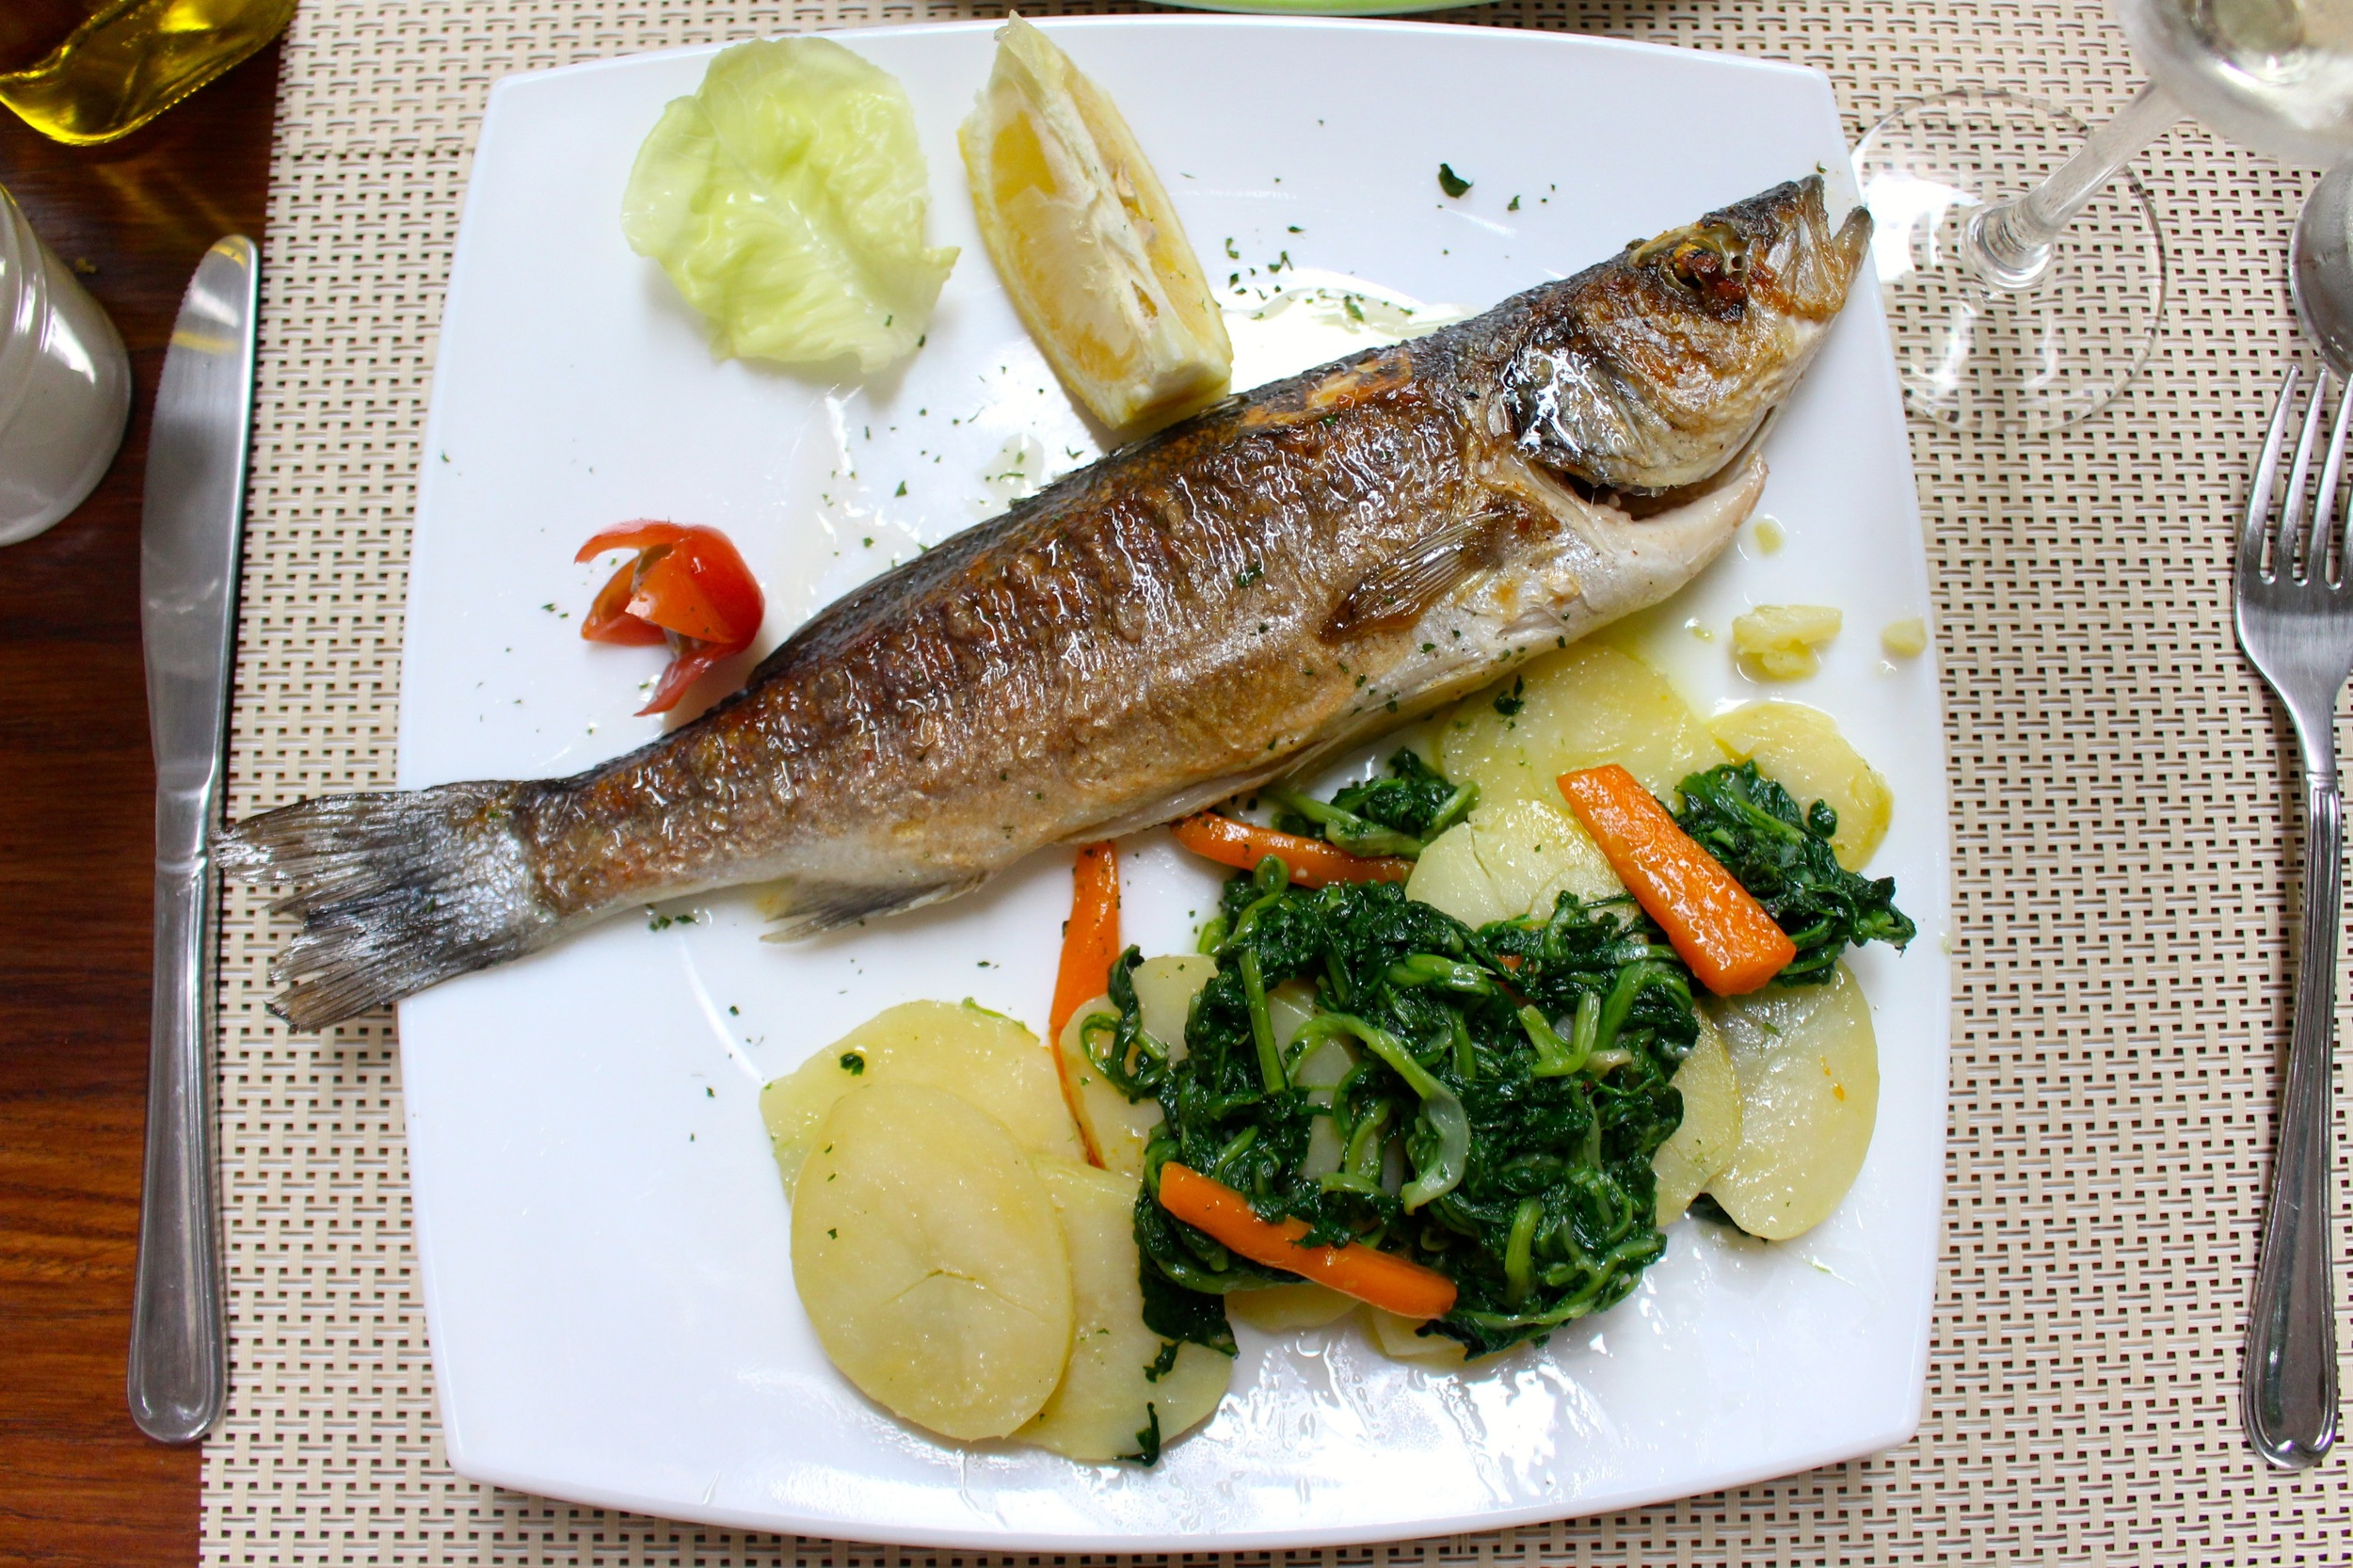 Blitva accompanies a perfect little sea bass at a restaurant in Korcula, an island off the coast of Croatia